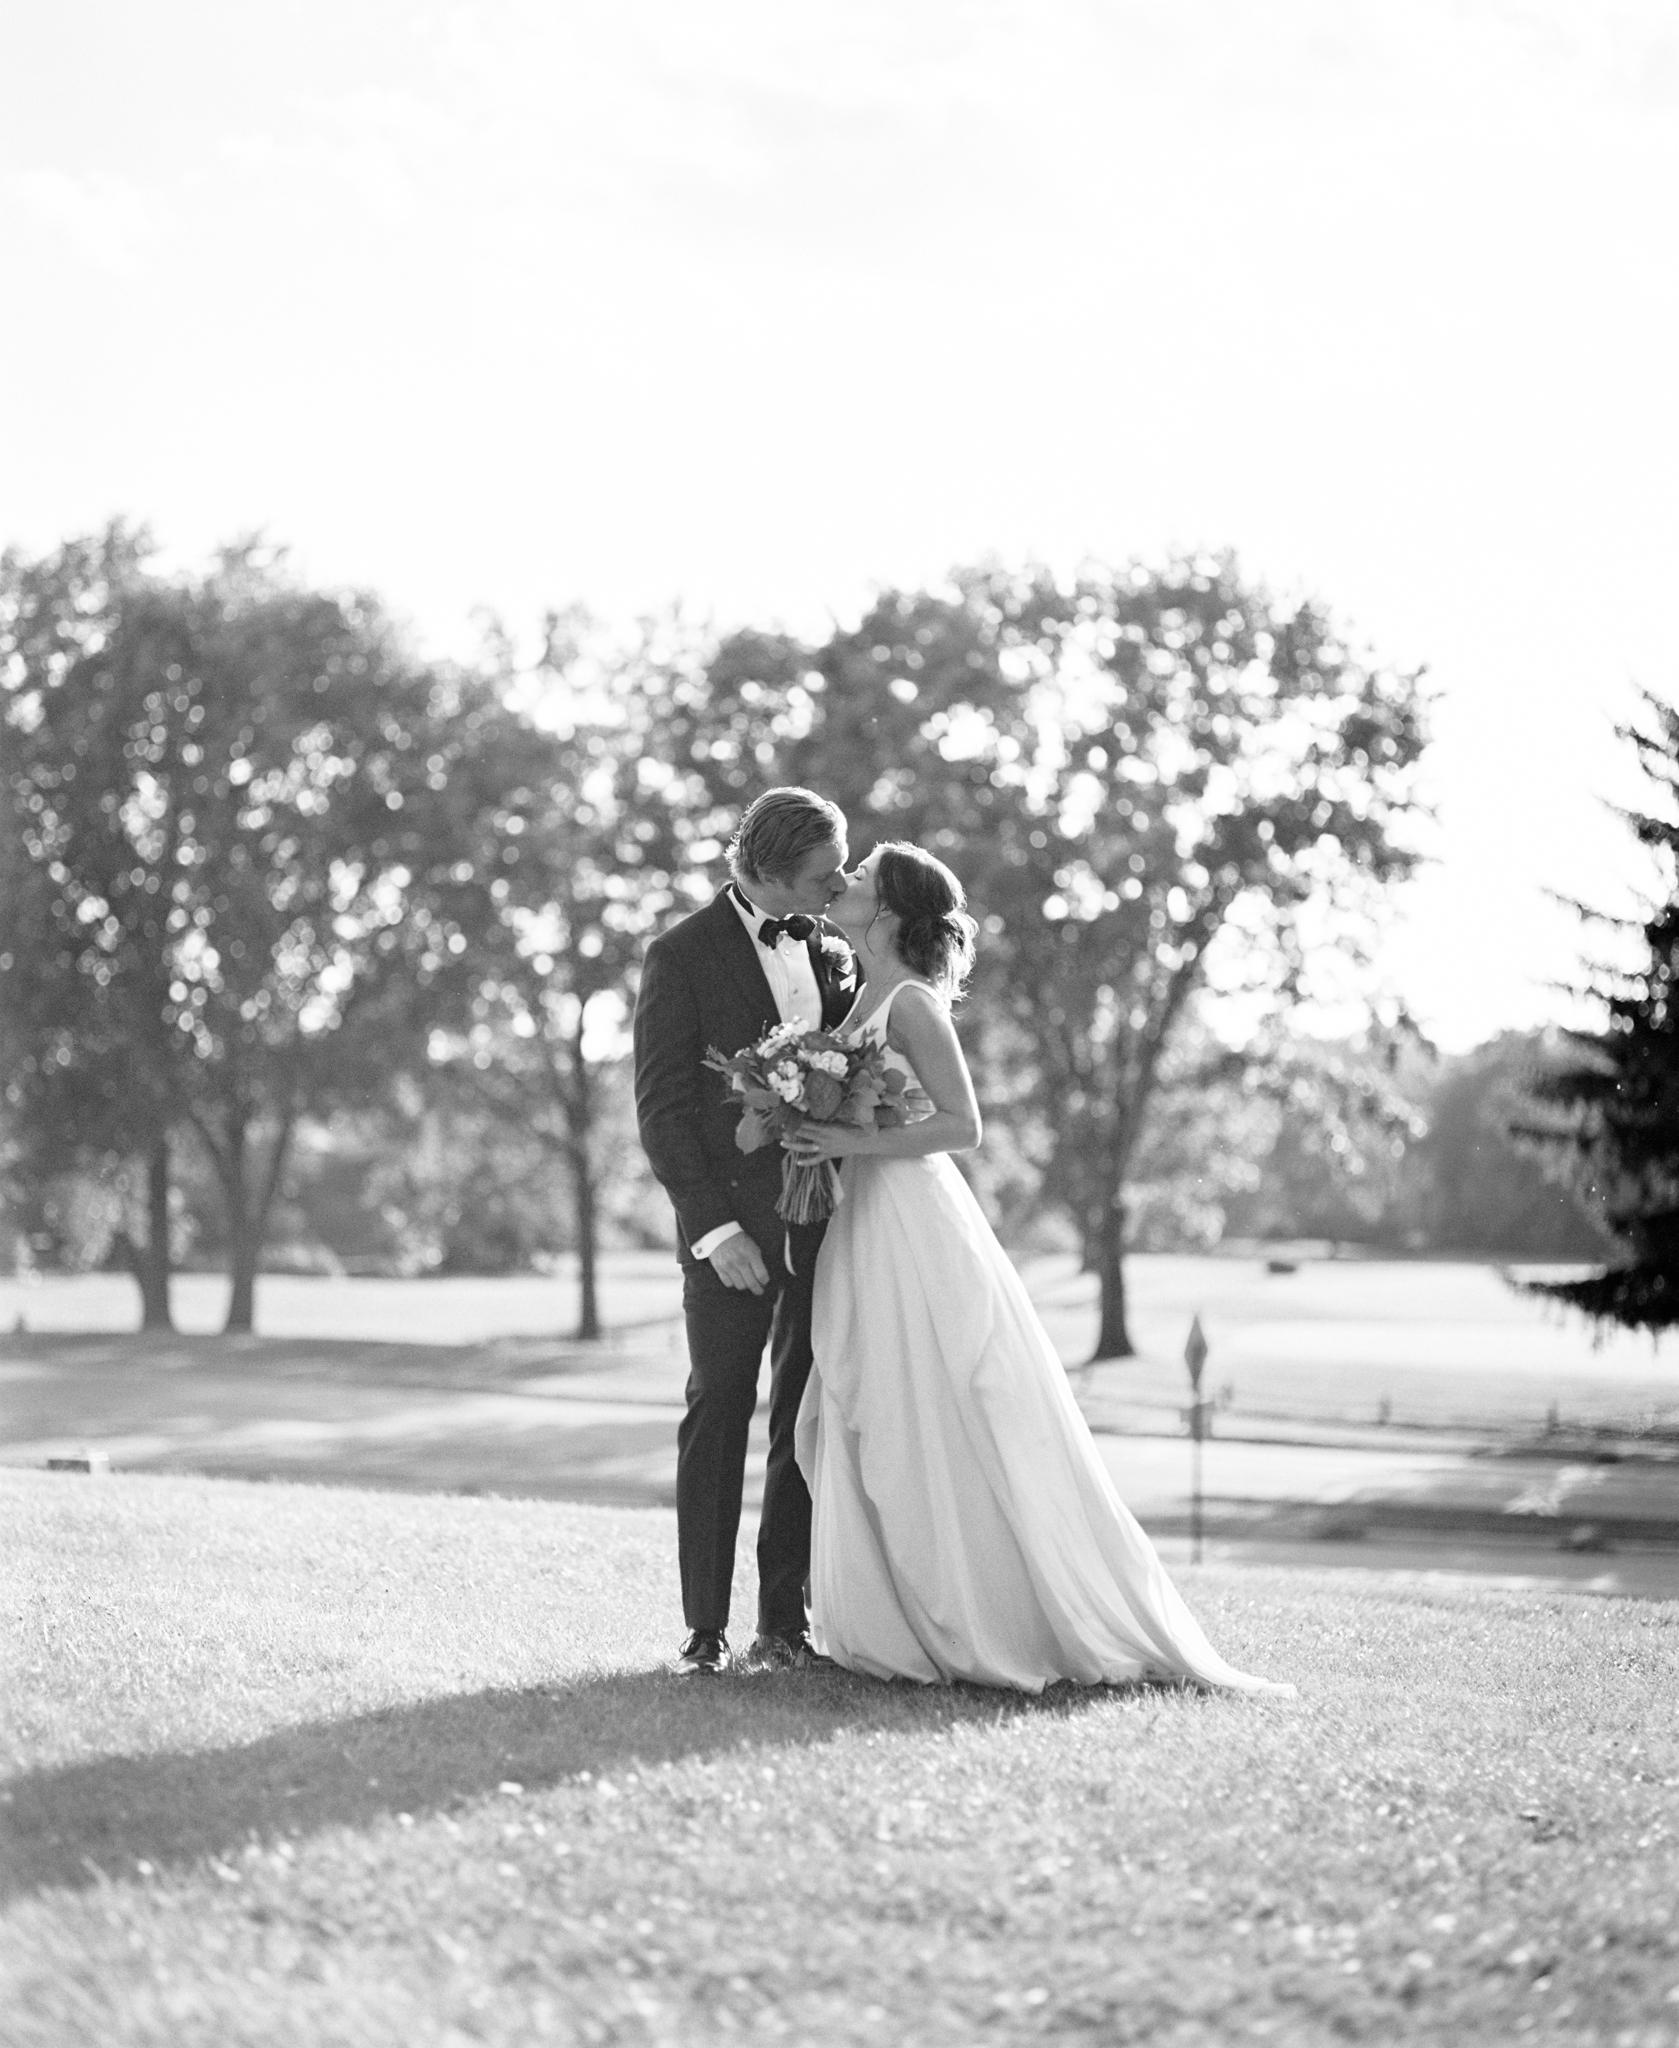 scott_eve_little_turtle_wedding_columbus_ohio (74 of 92).jpg